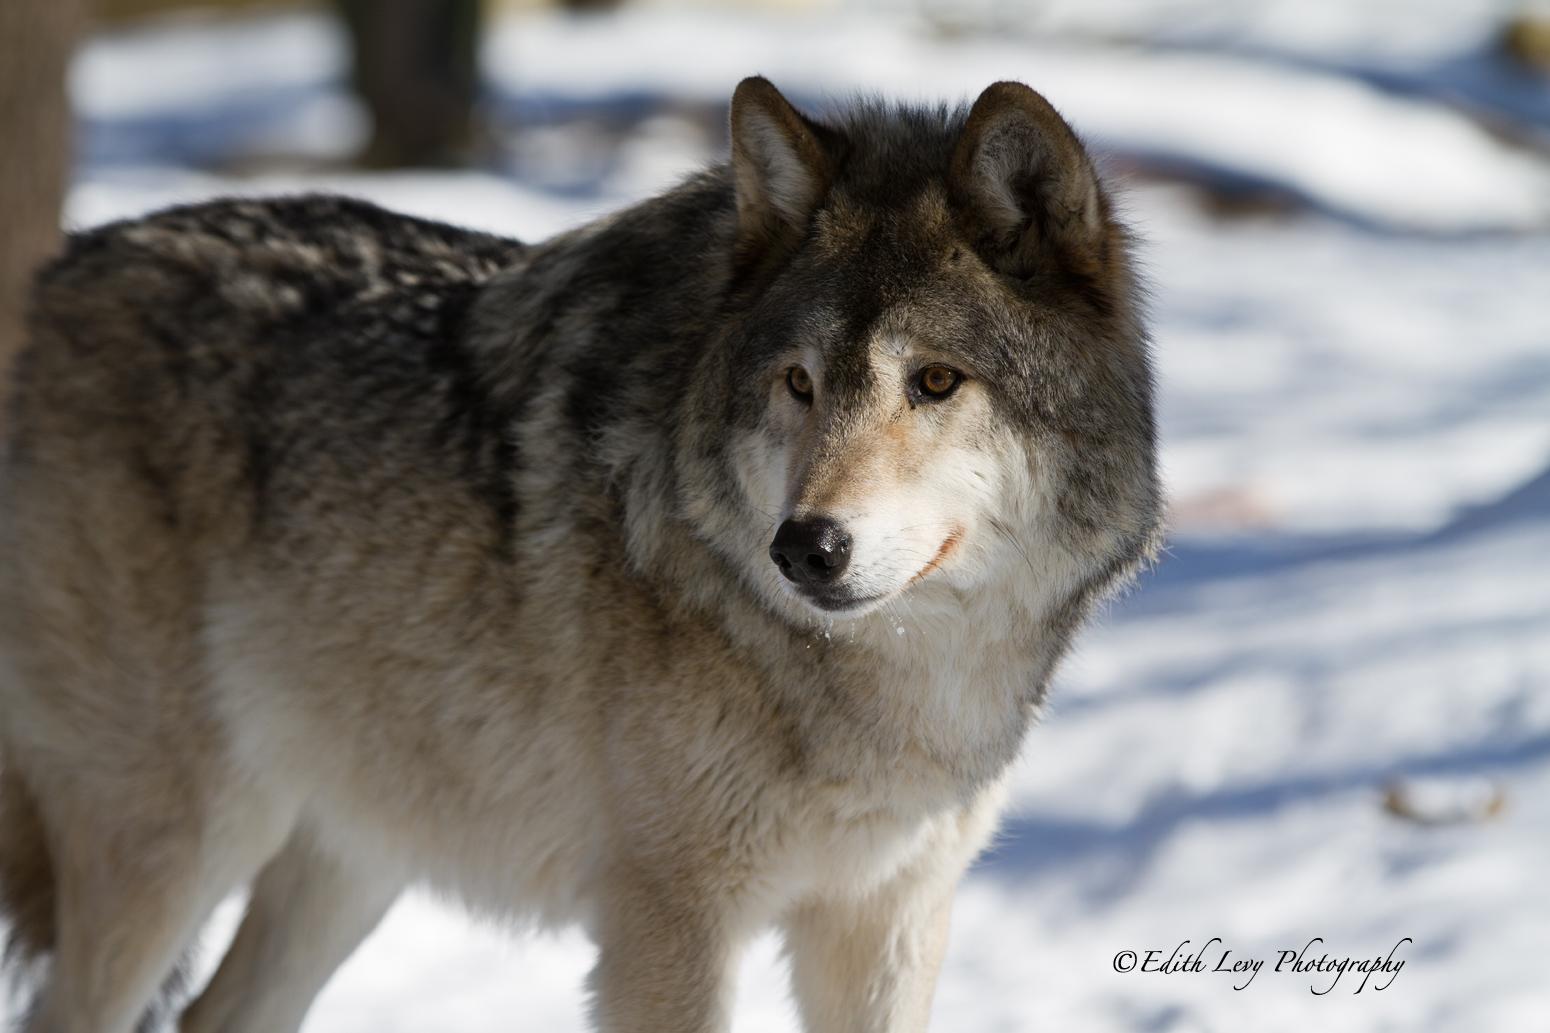 Muskoka Wildlife Reserve, wolf, winter, Ontario, snow, grey wolf